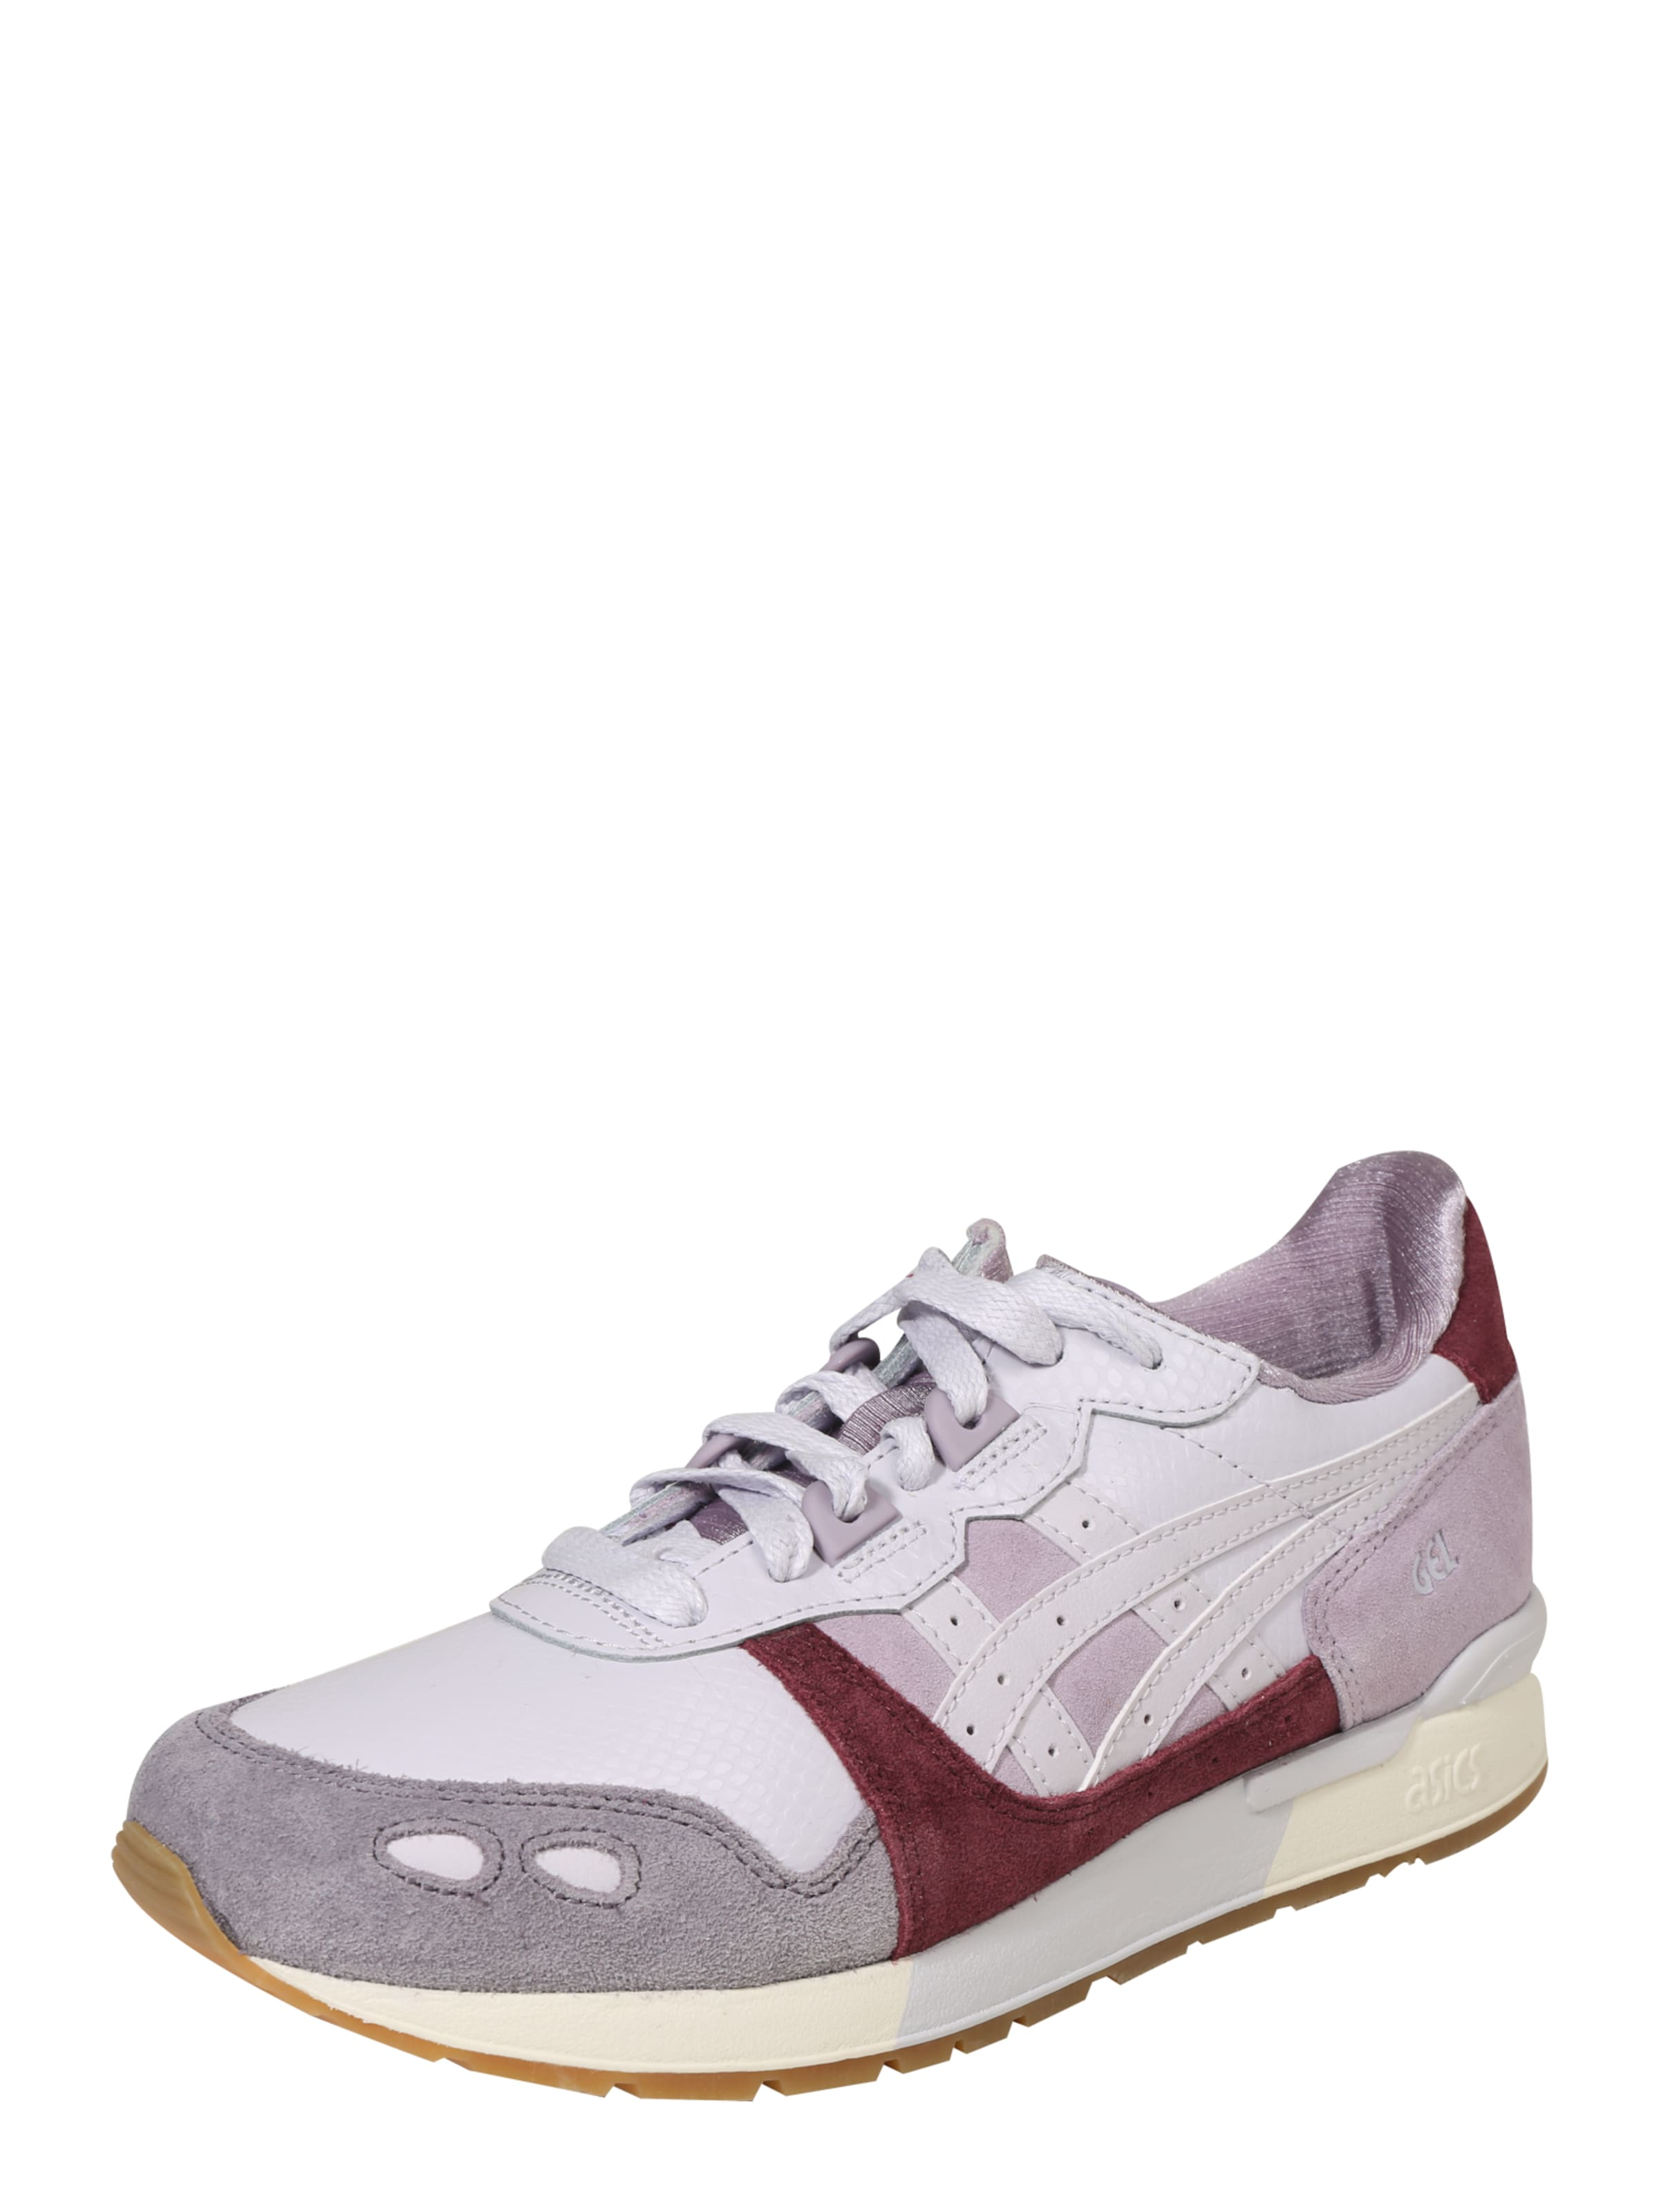 Haltbare Mode billige Schuhe Asics Tiger | Sneaker 'GEL-LYTE' 'GEL-LYTE' 'GEL-LYTE' Schuhe Gut getragene Schuhe 44f0f5